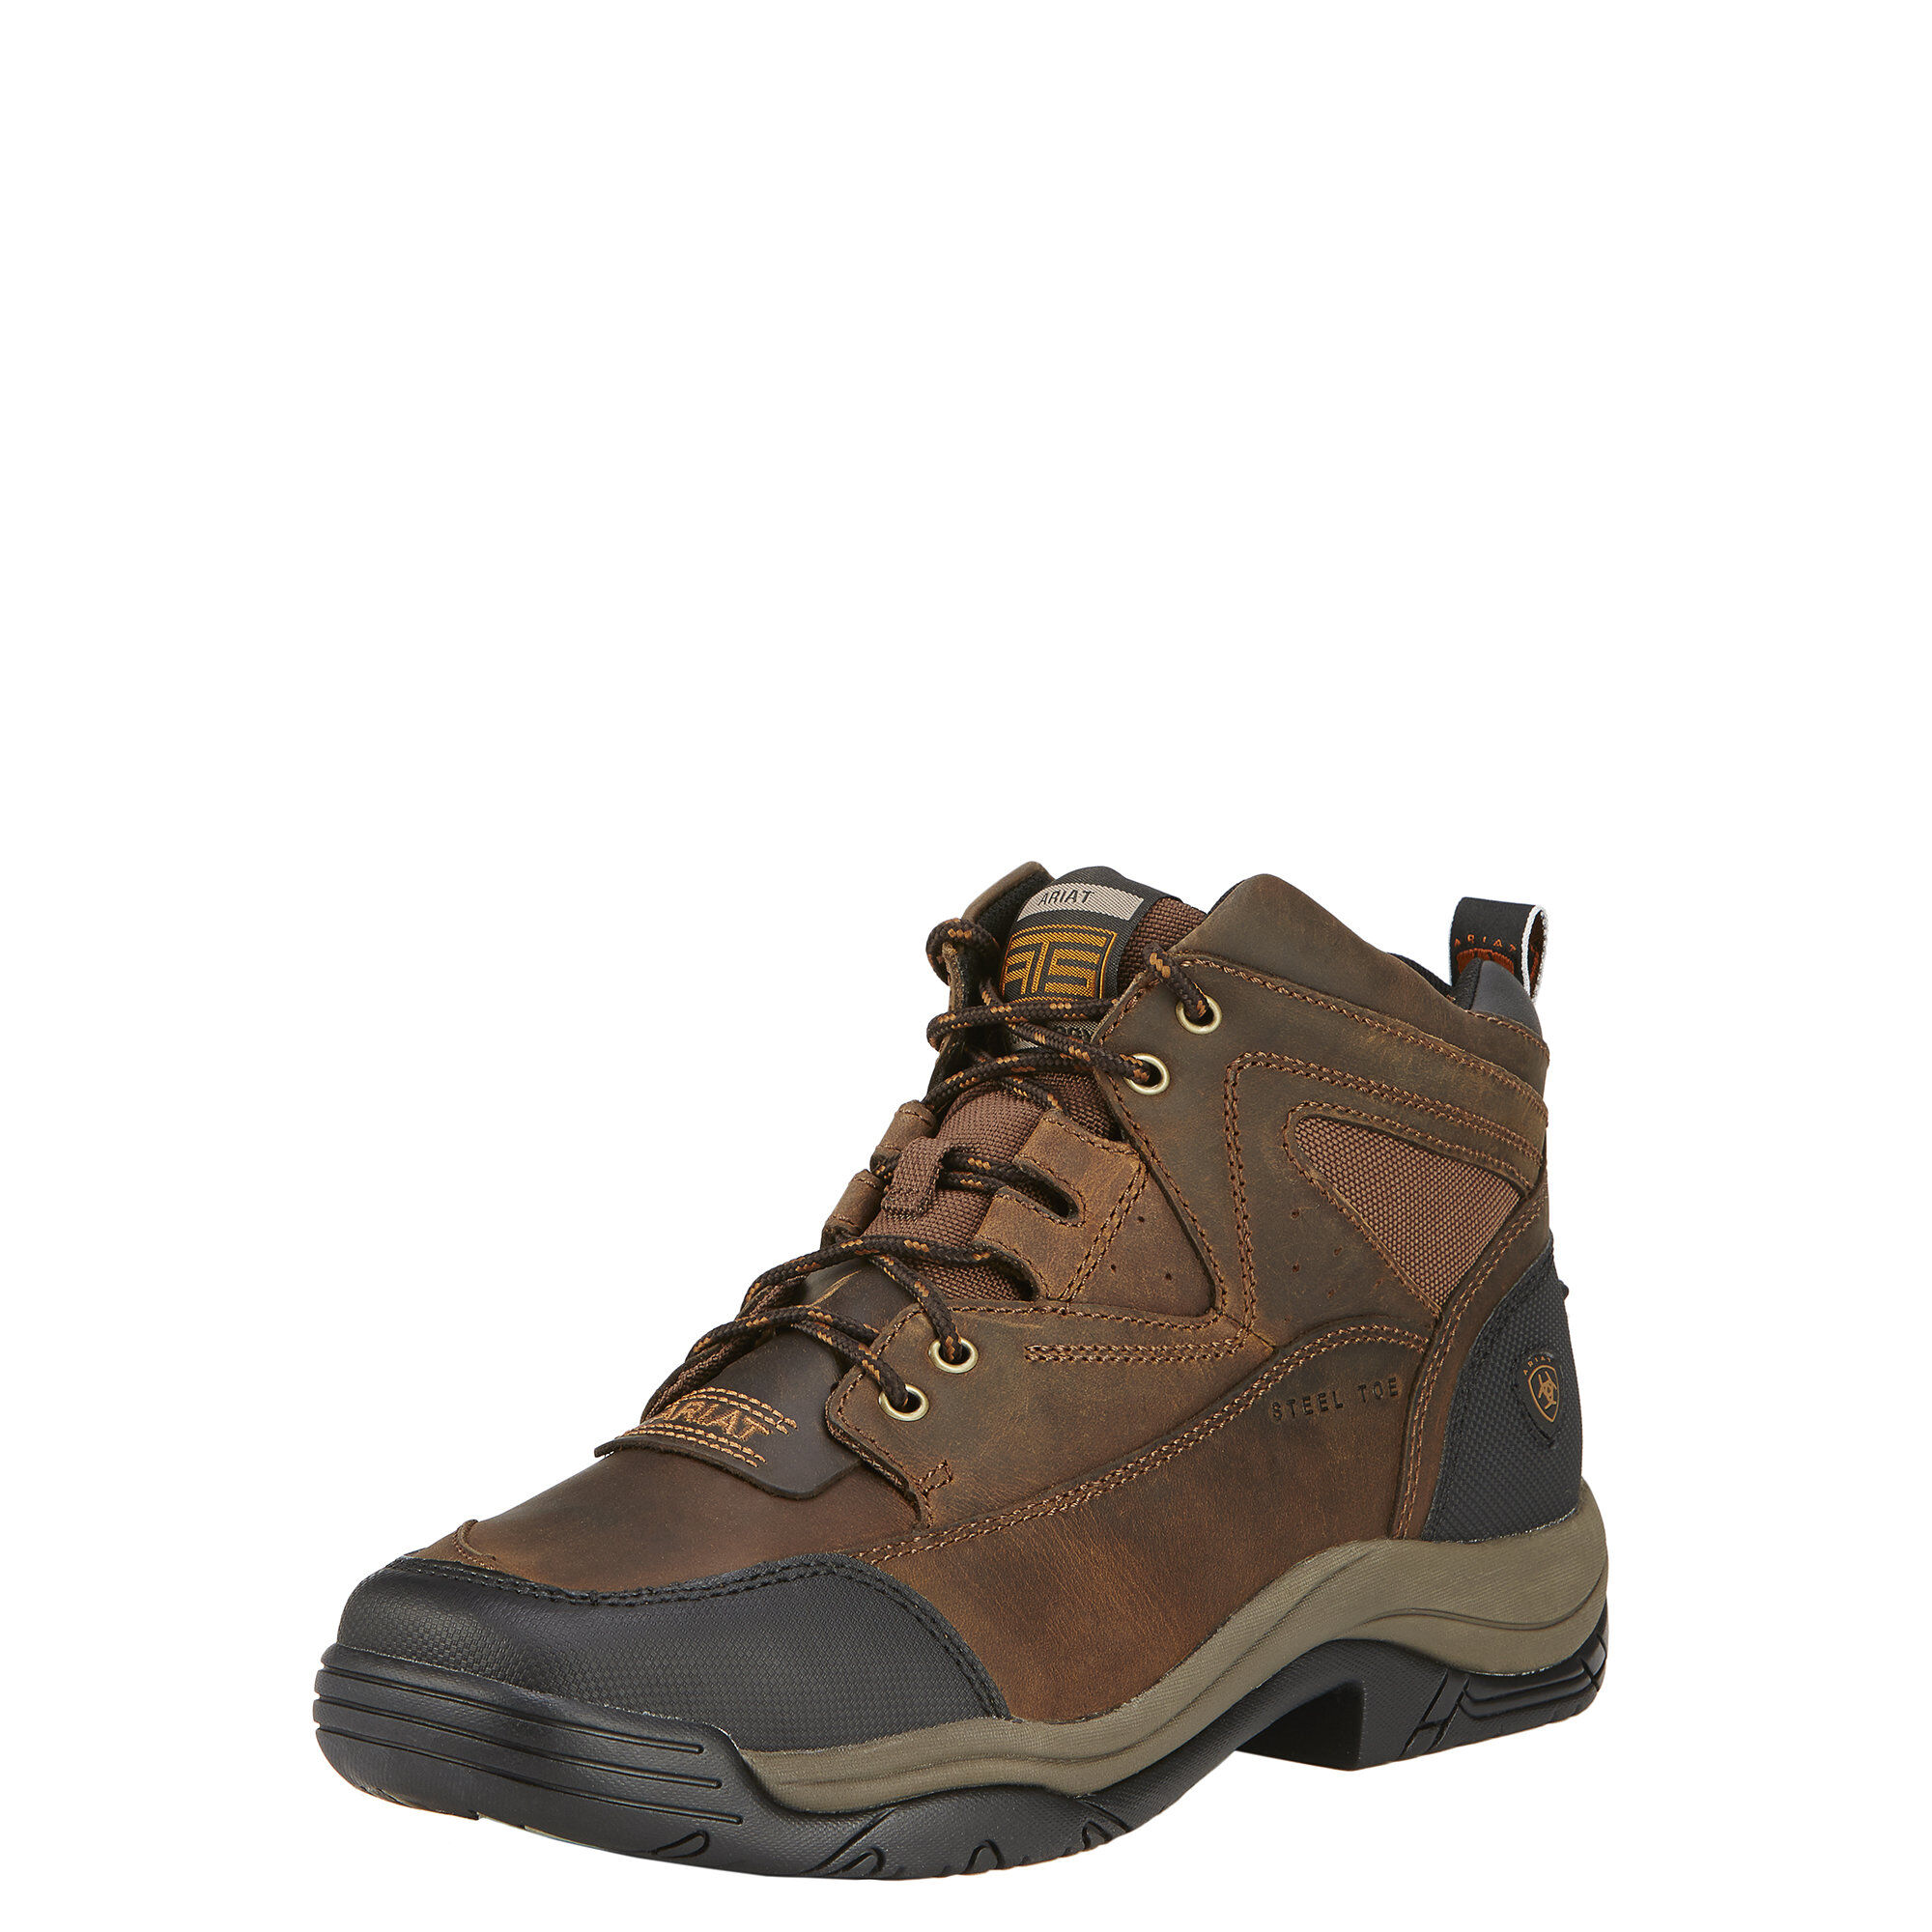 Terrain Wide Square Toe Steel Toe Work Boot